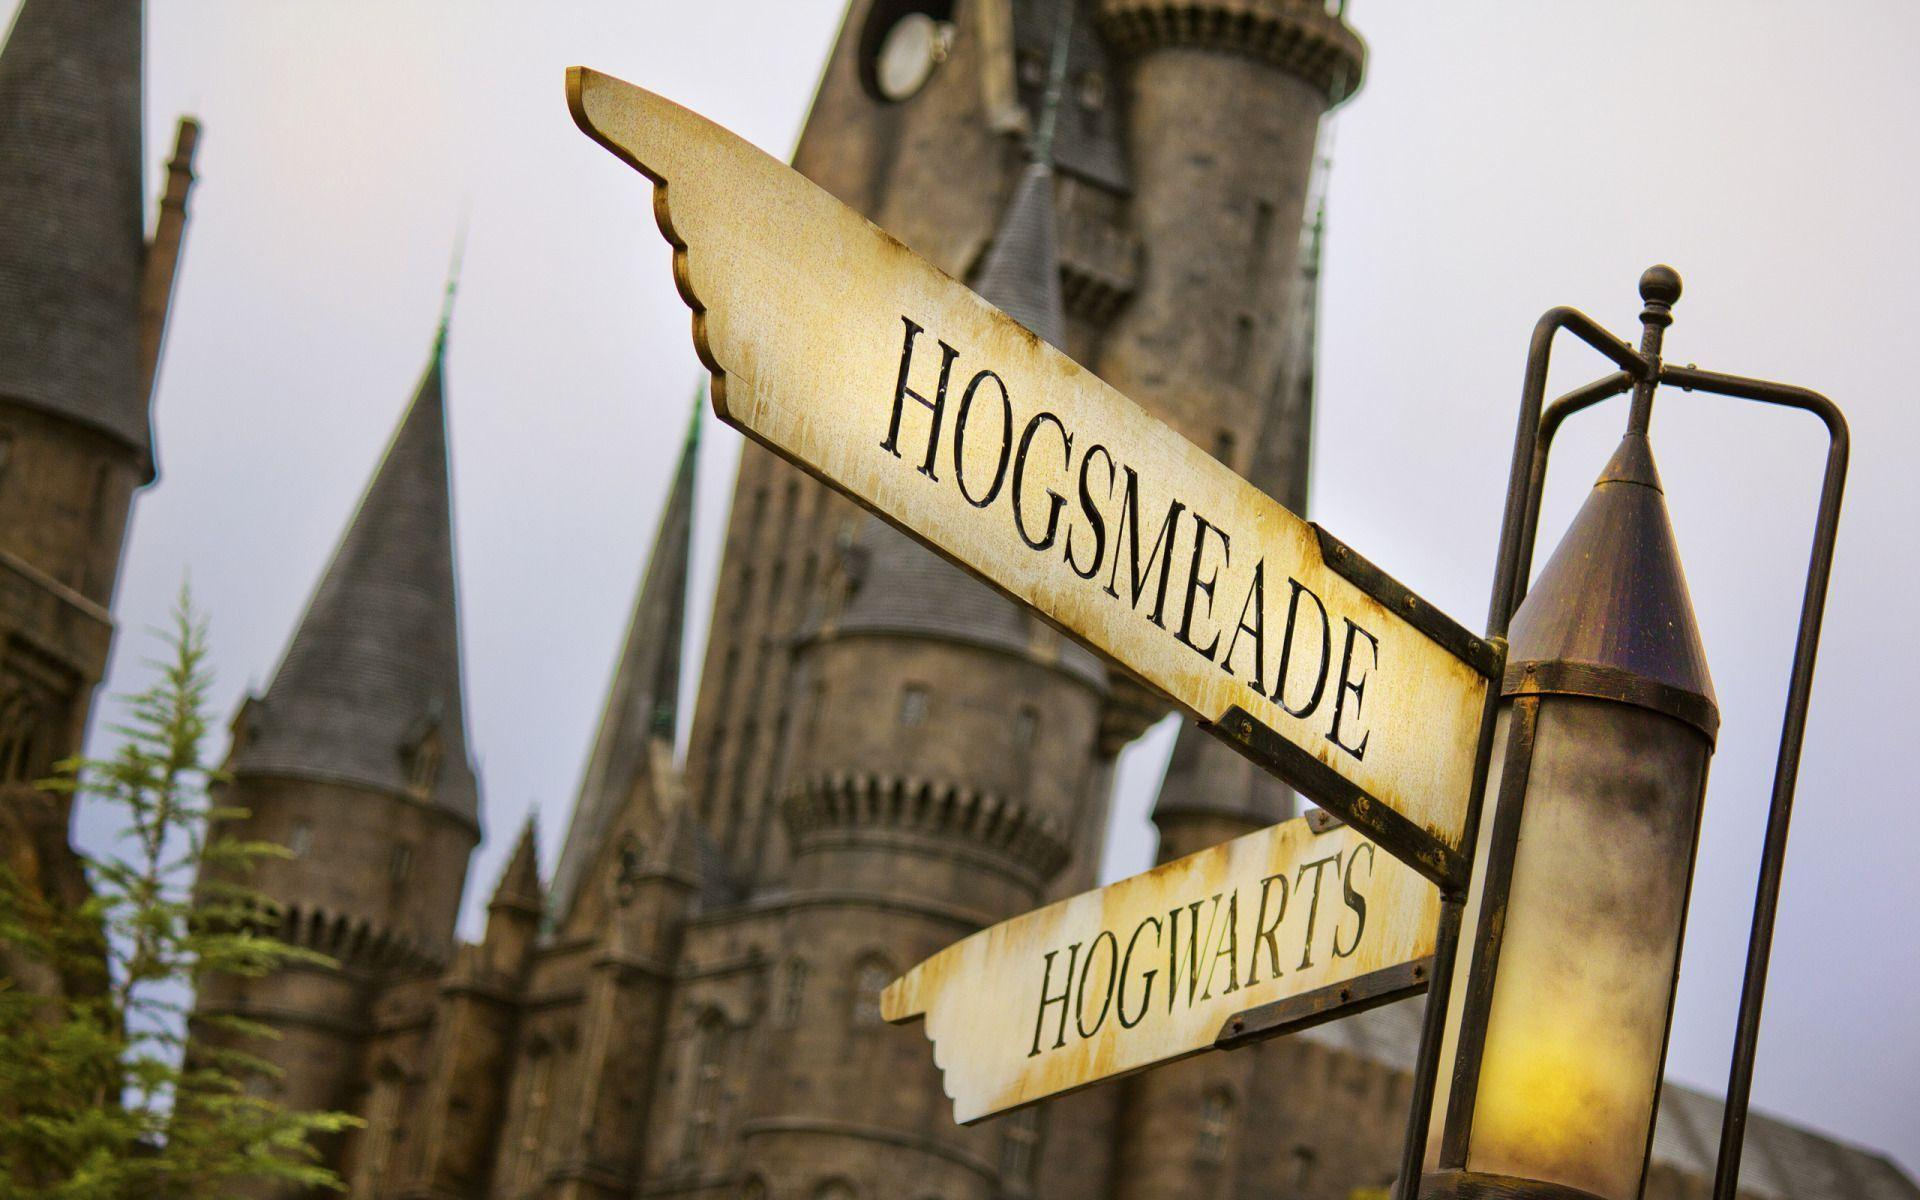 hogwarts wallpaper by sx2 - photo #24